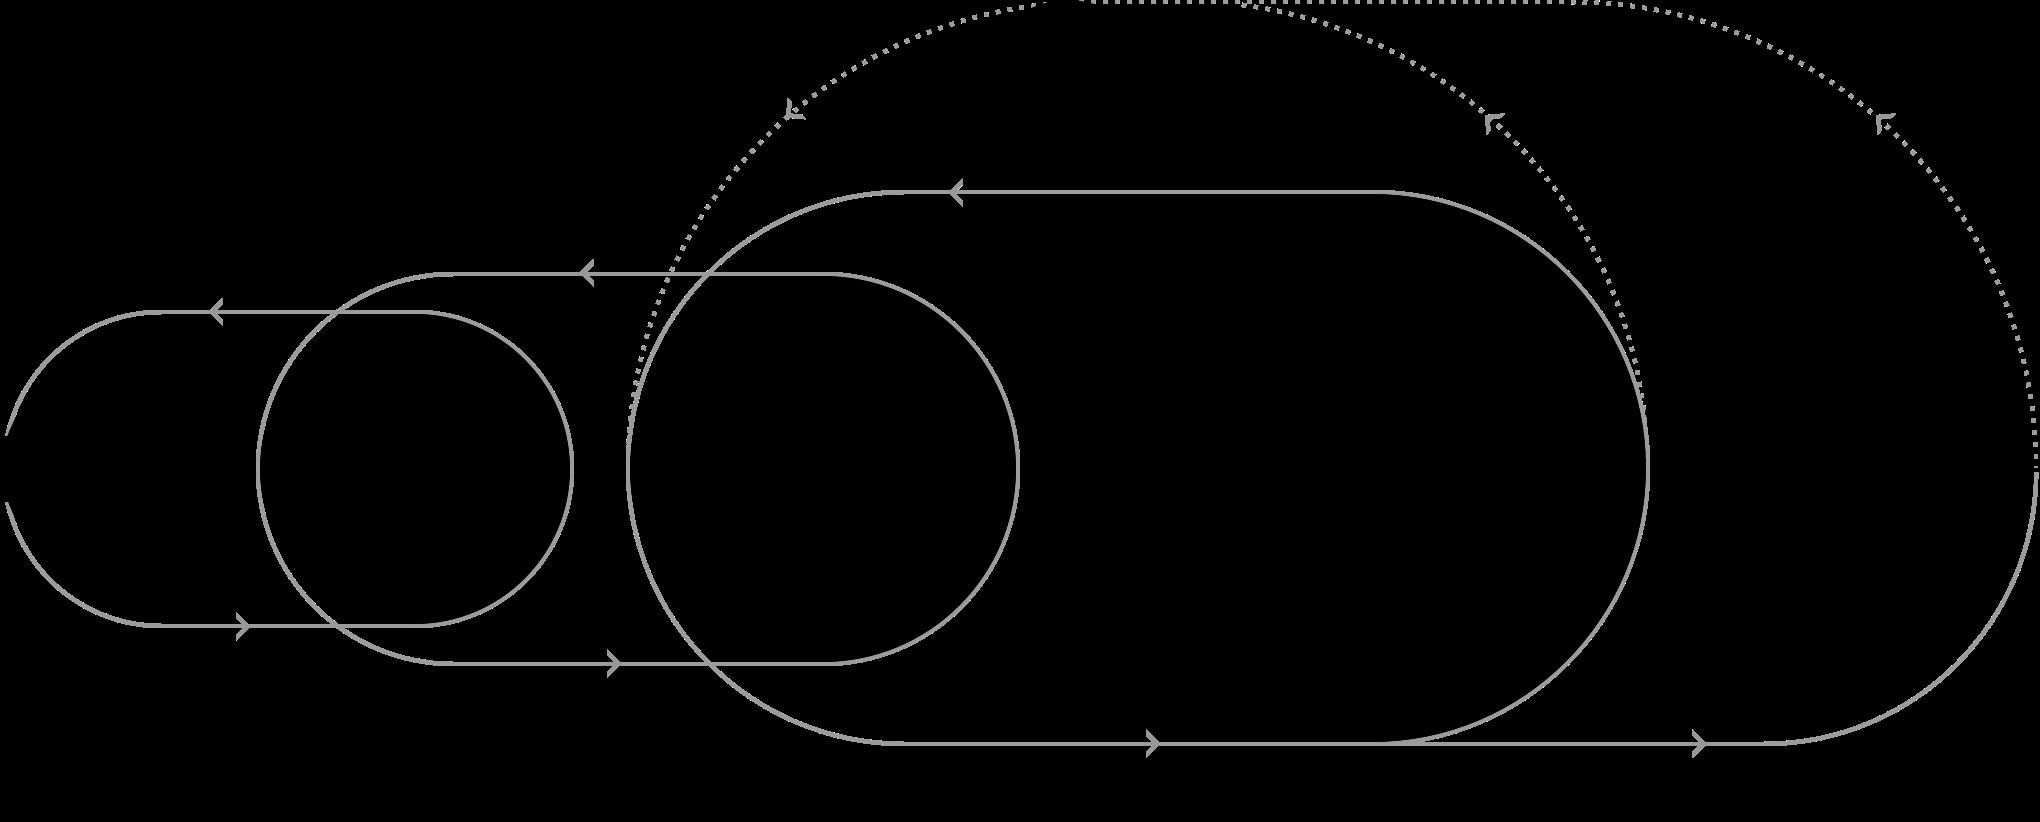 process-diagram-2.png